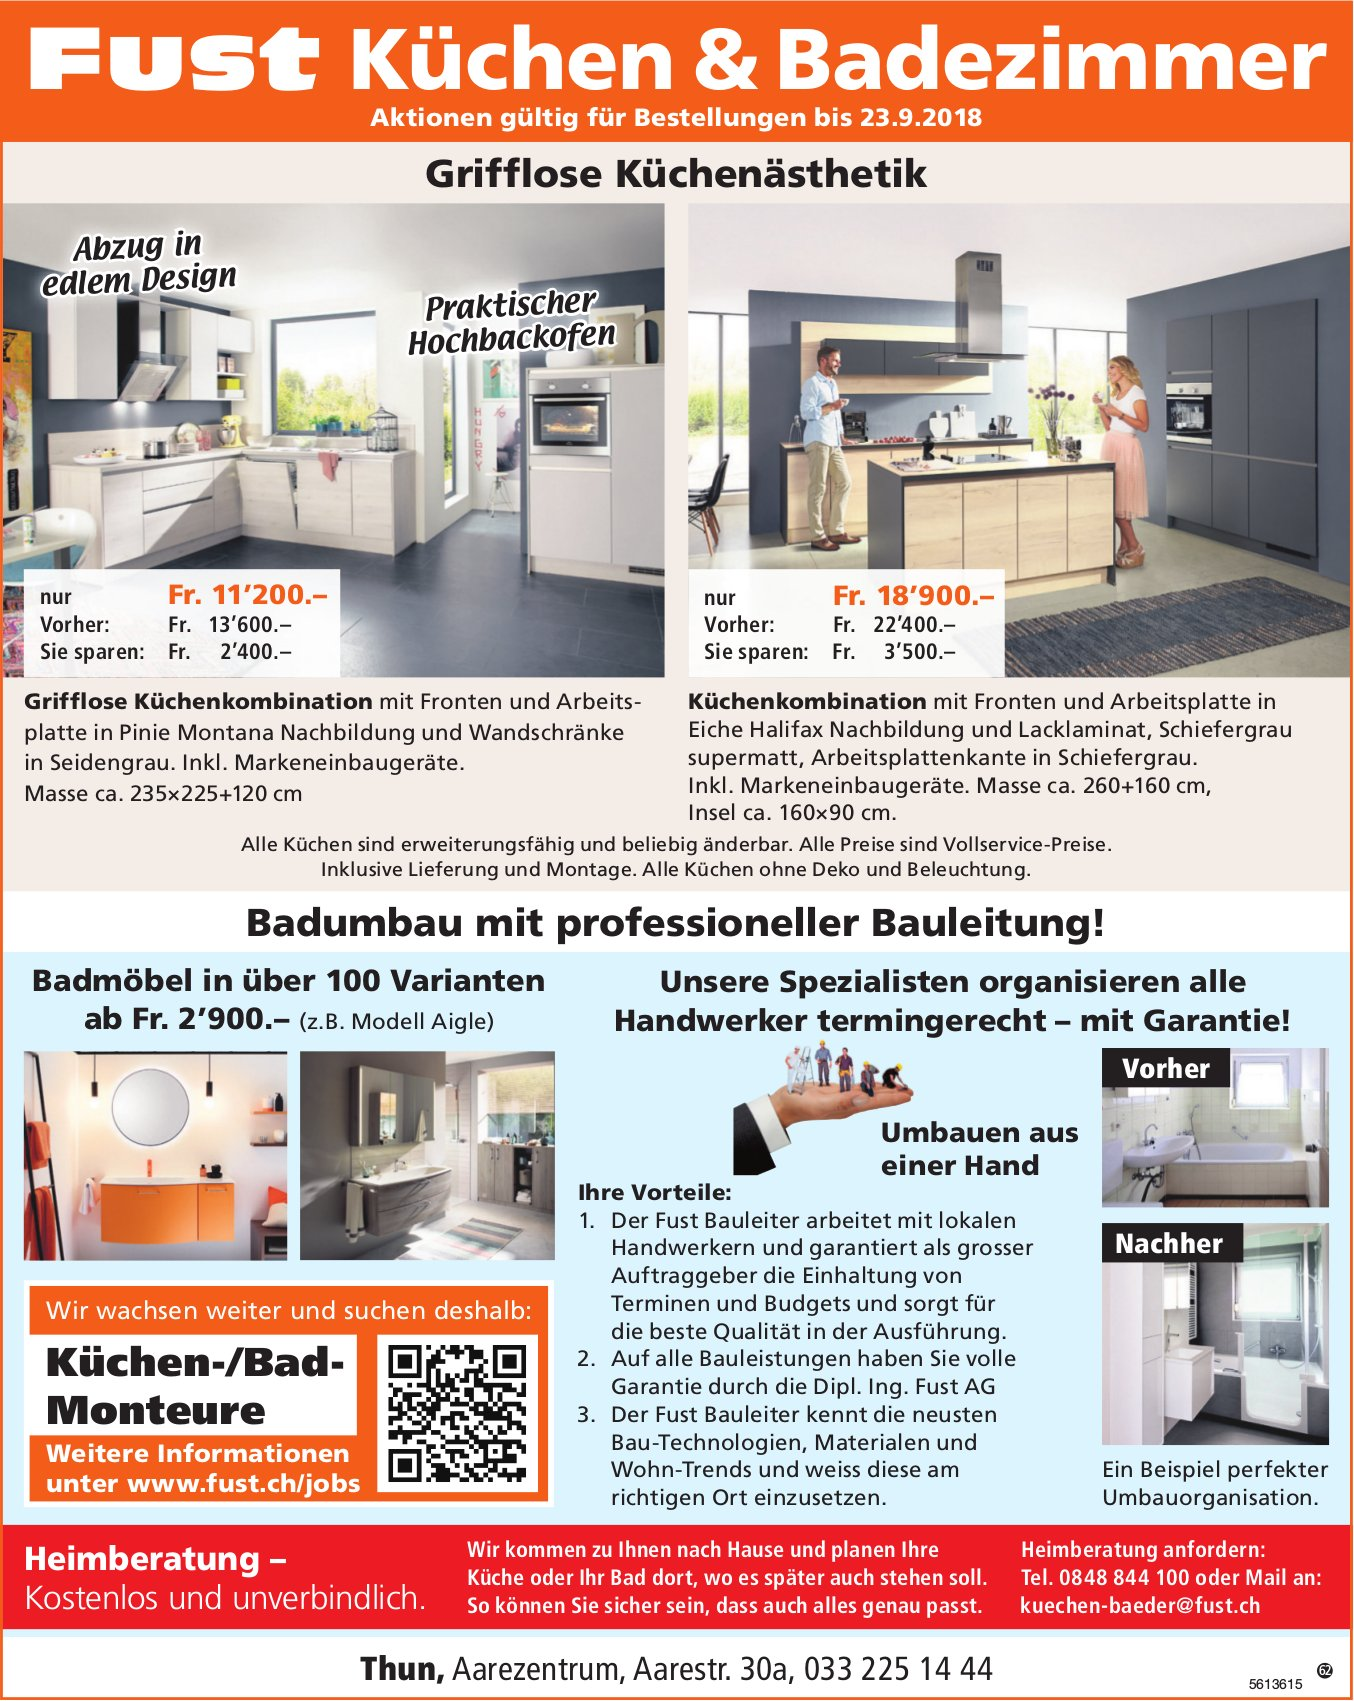 Fust Küchen & Badezimmer, Thun